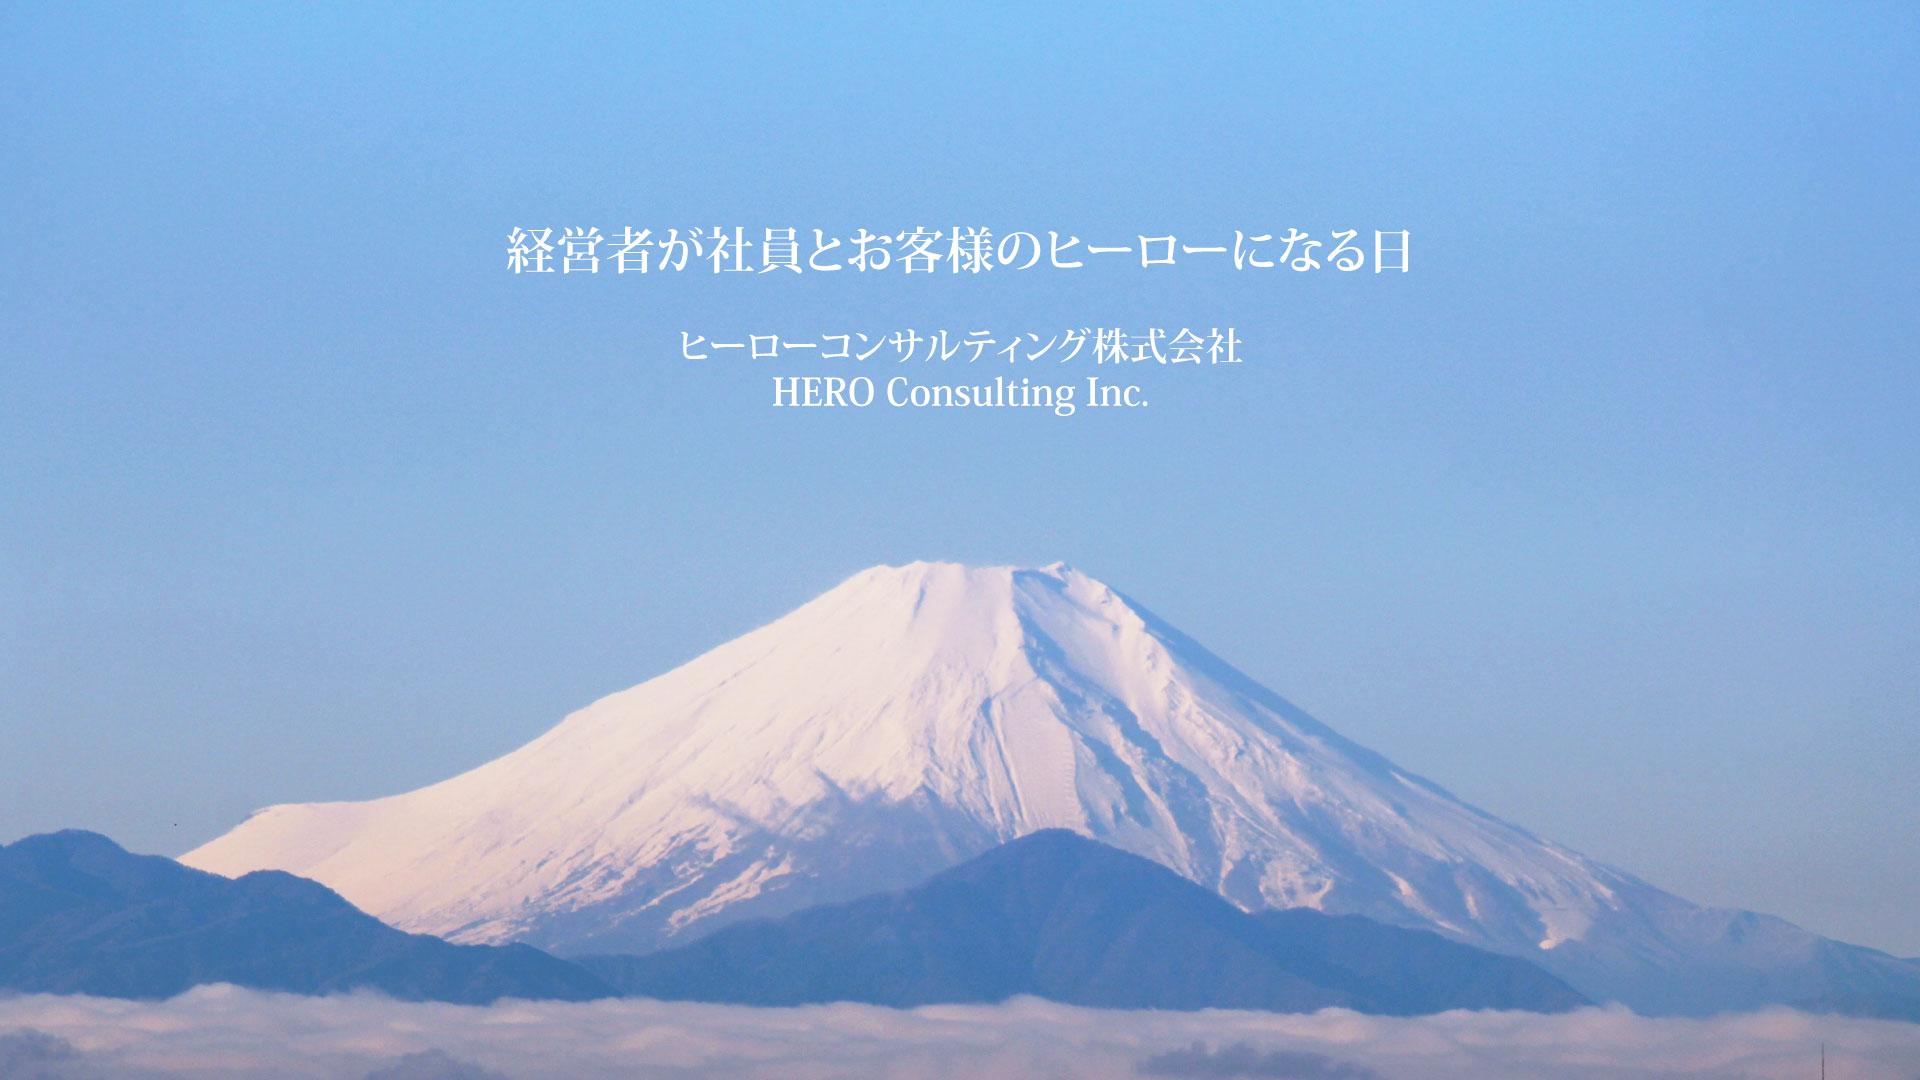 Blog :: ヒーローコンサルティング株式会社